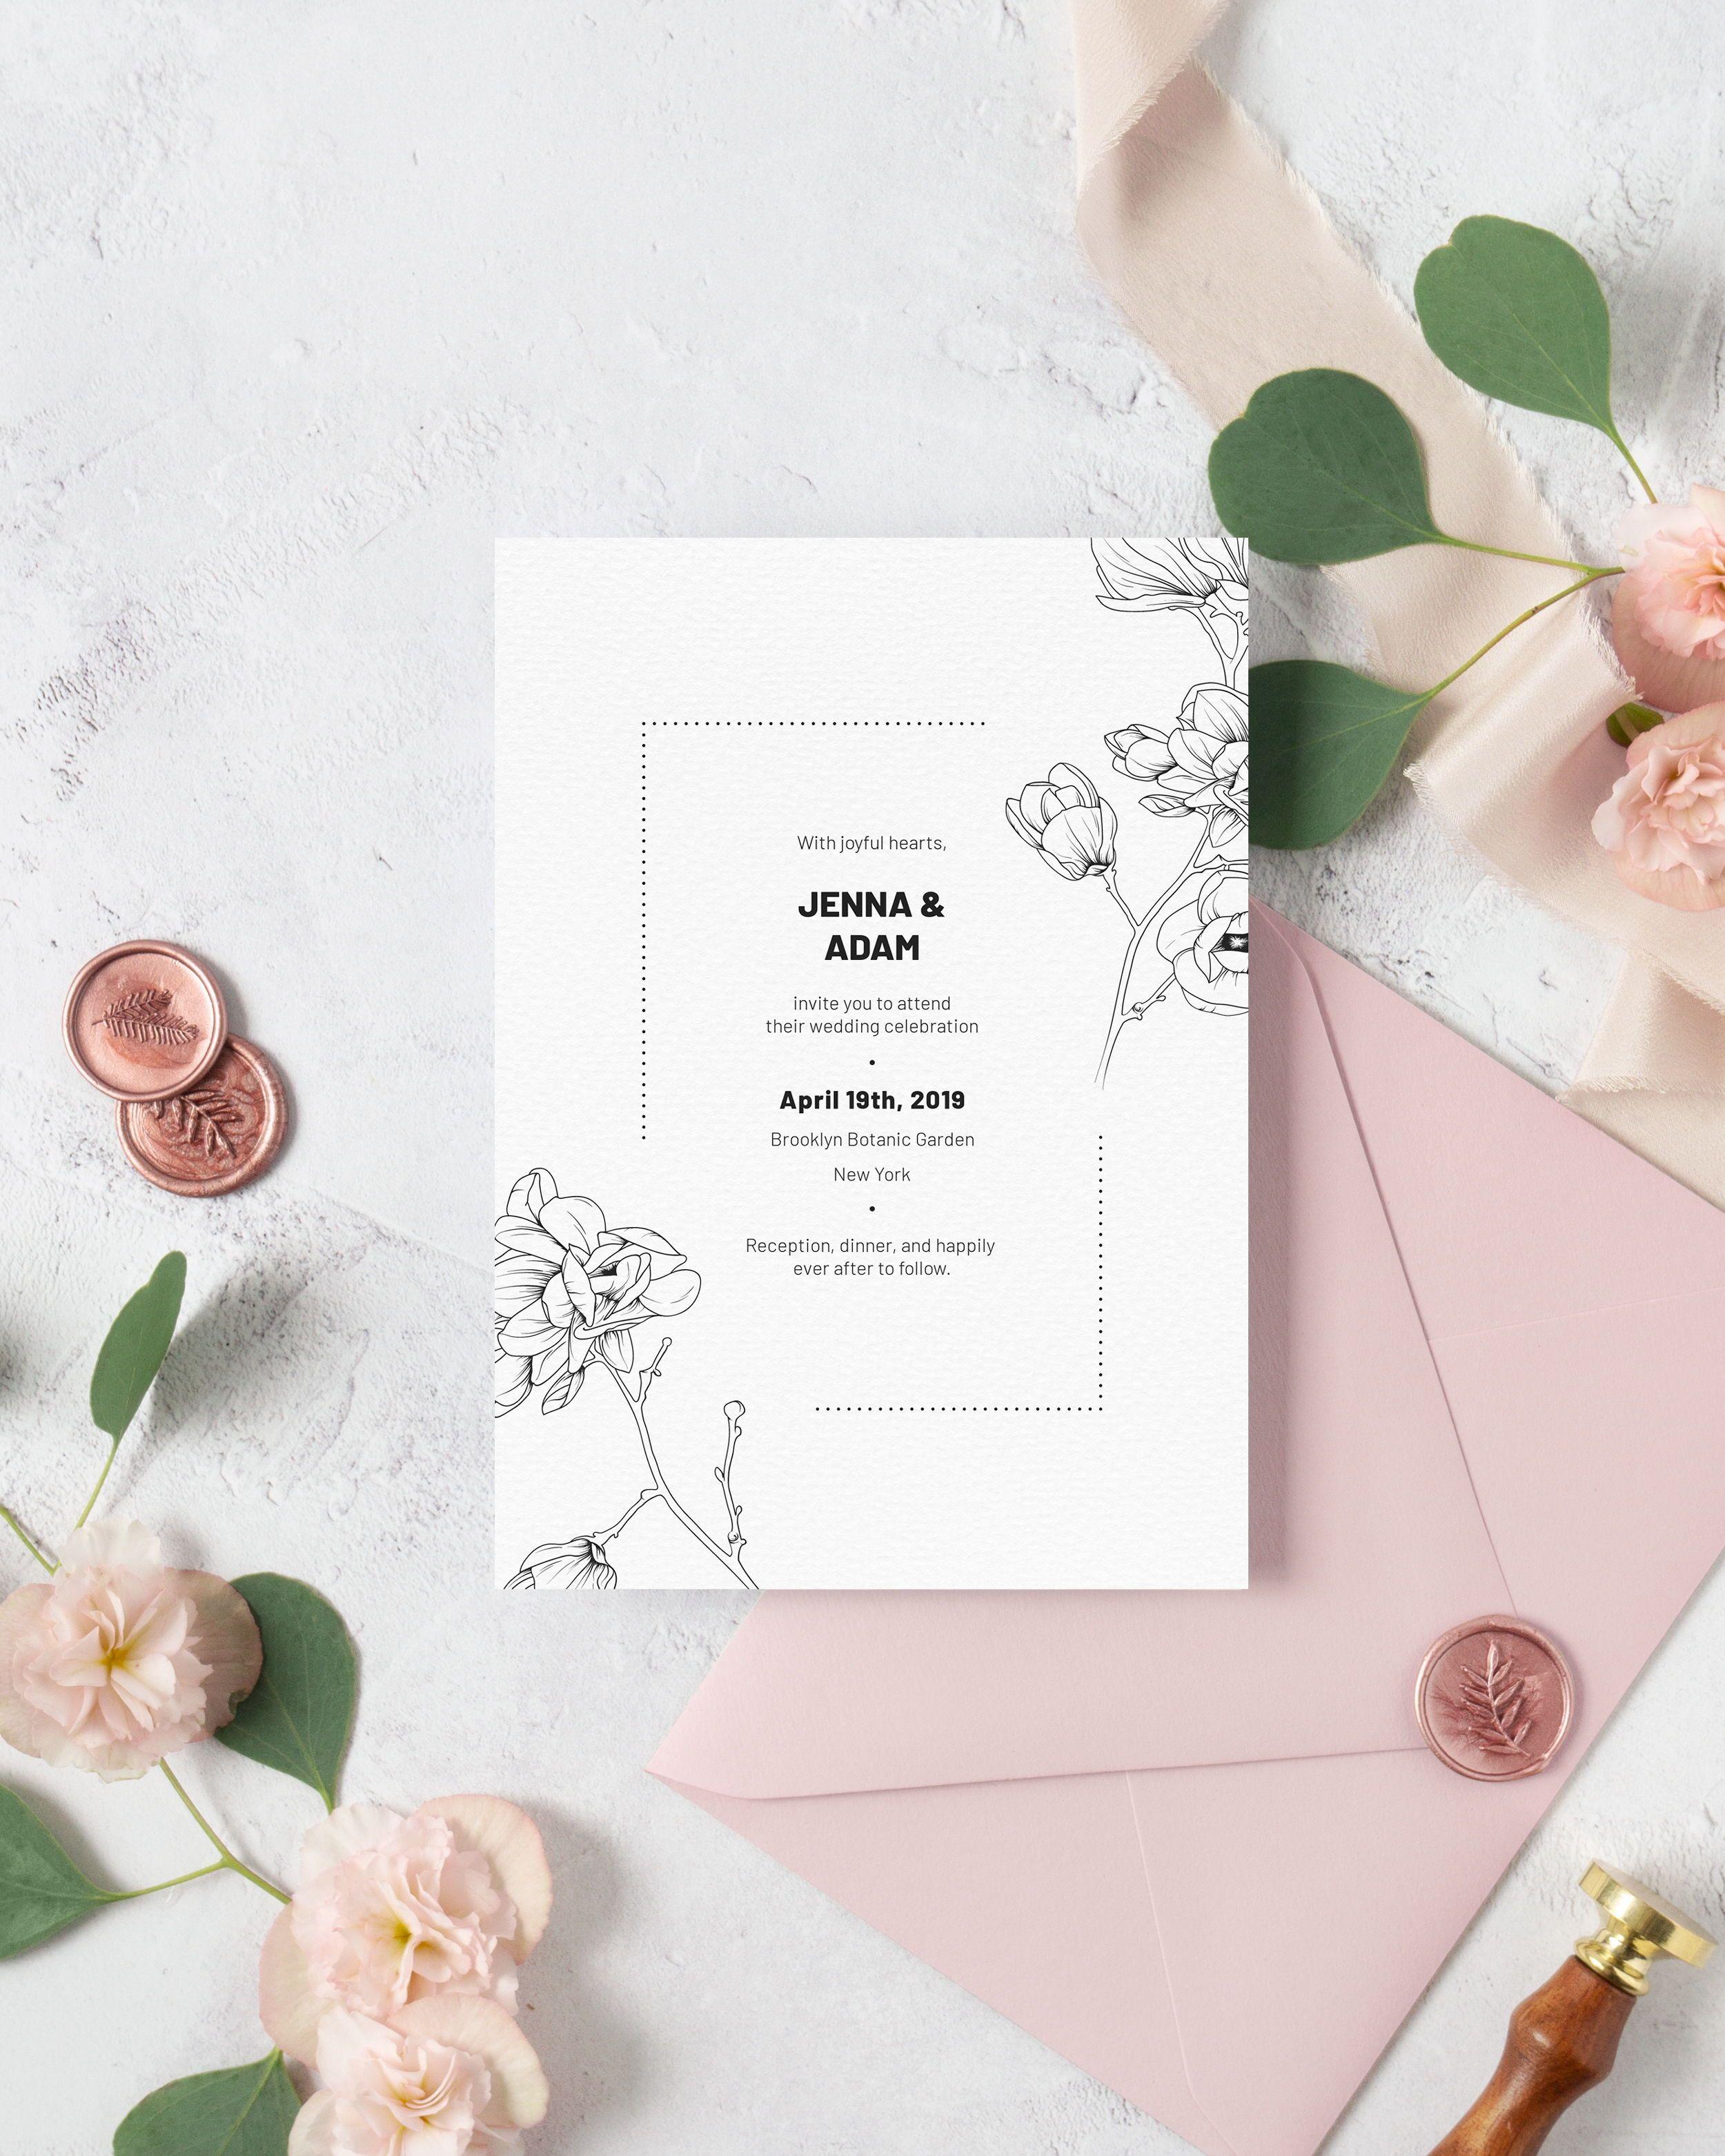 Floral Wedding Invitation Template Modern Black And White Magnolia Wedding Invite Printable Spring Wedding Invitation Cards Mg18 Floral Wedding Invitations Wedding Invitations Wedding Invitation Templates